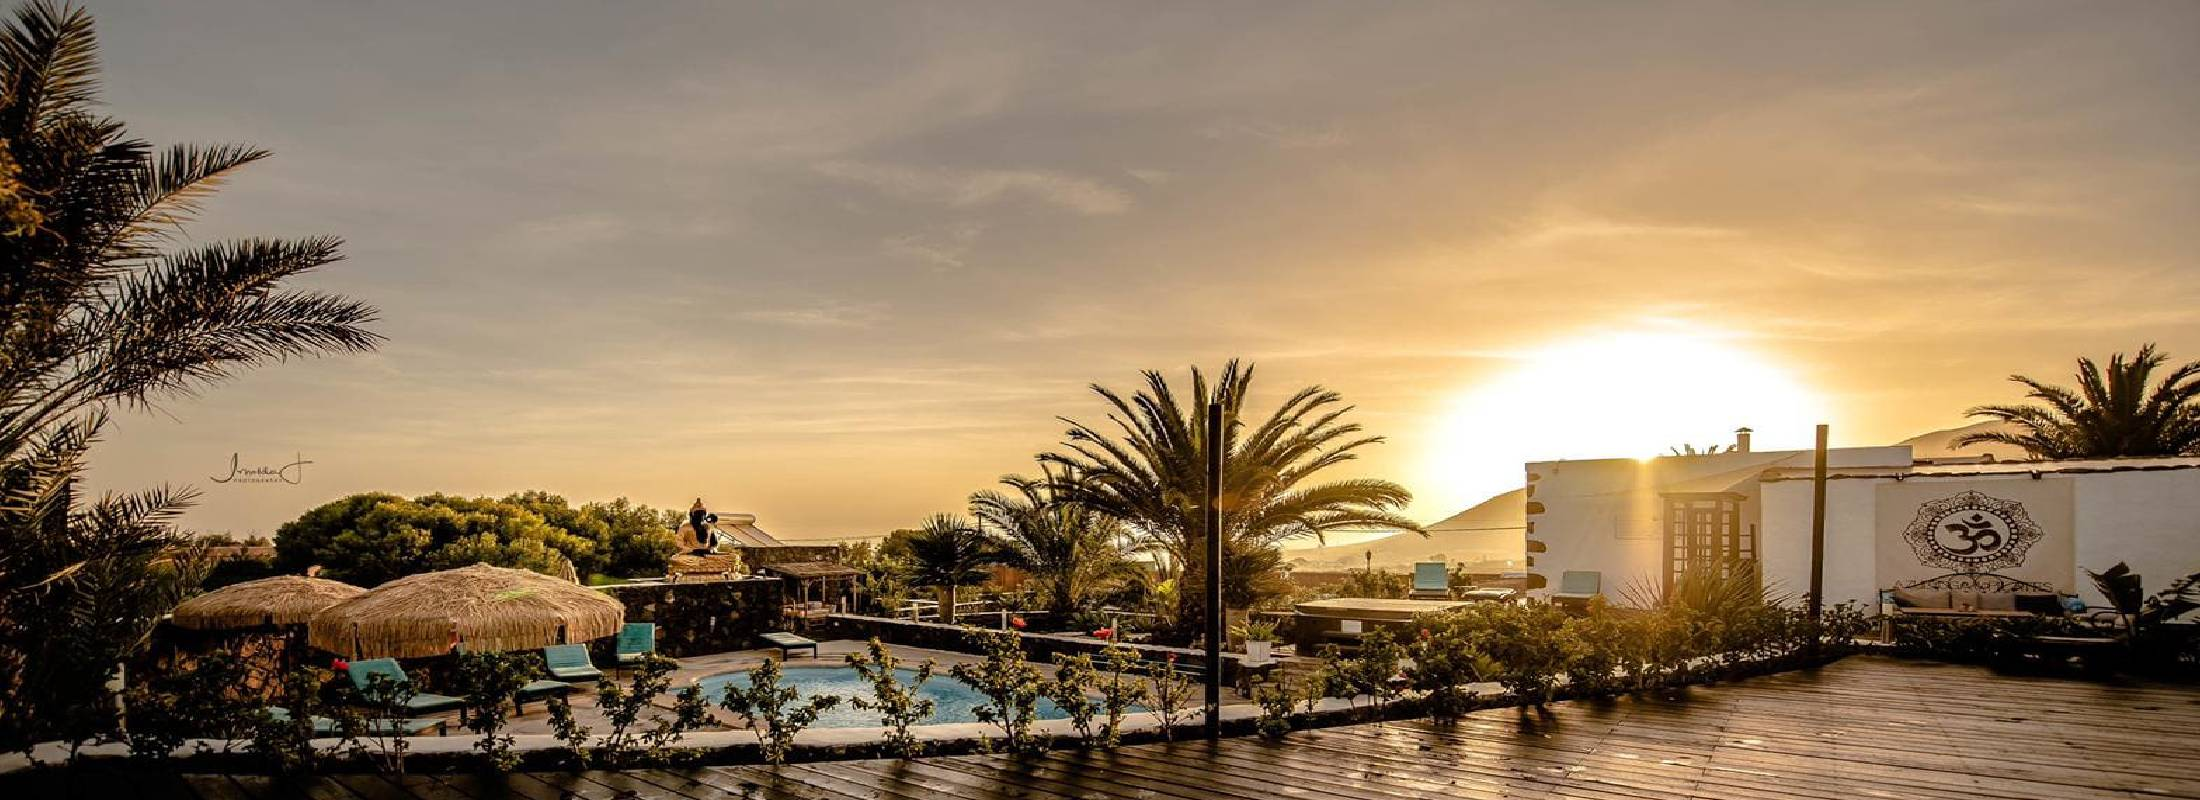 retiro en Fuerteventura de yoga y pilates